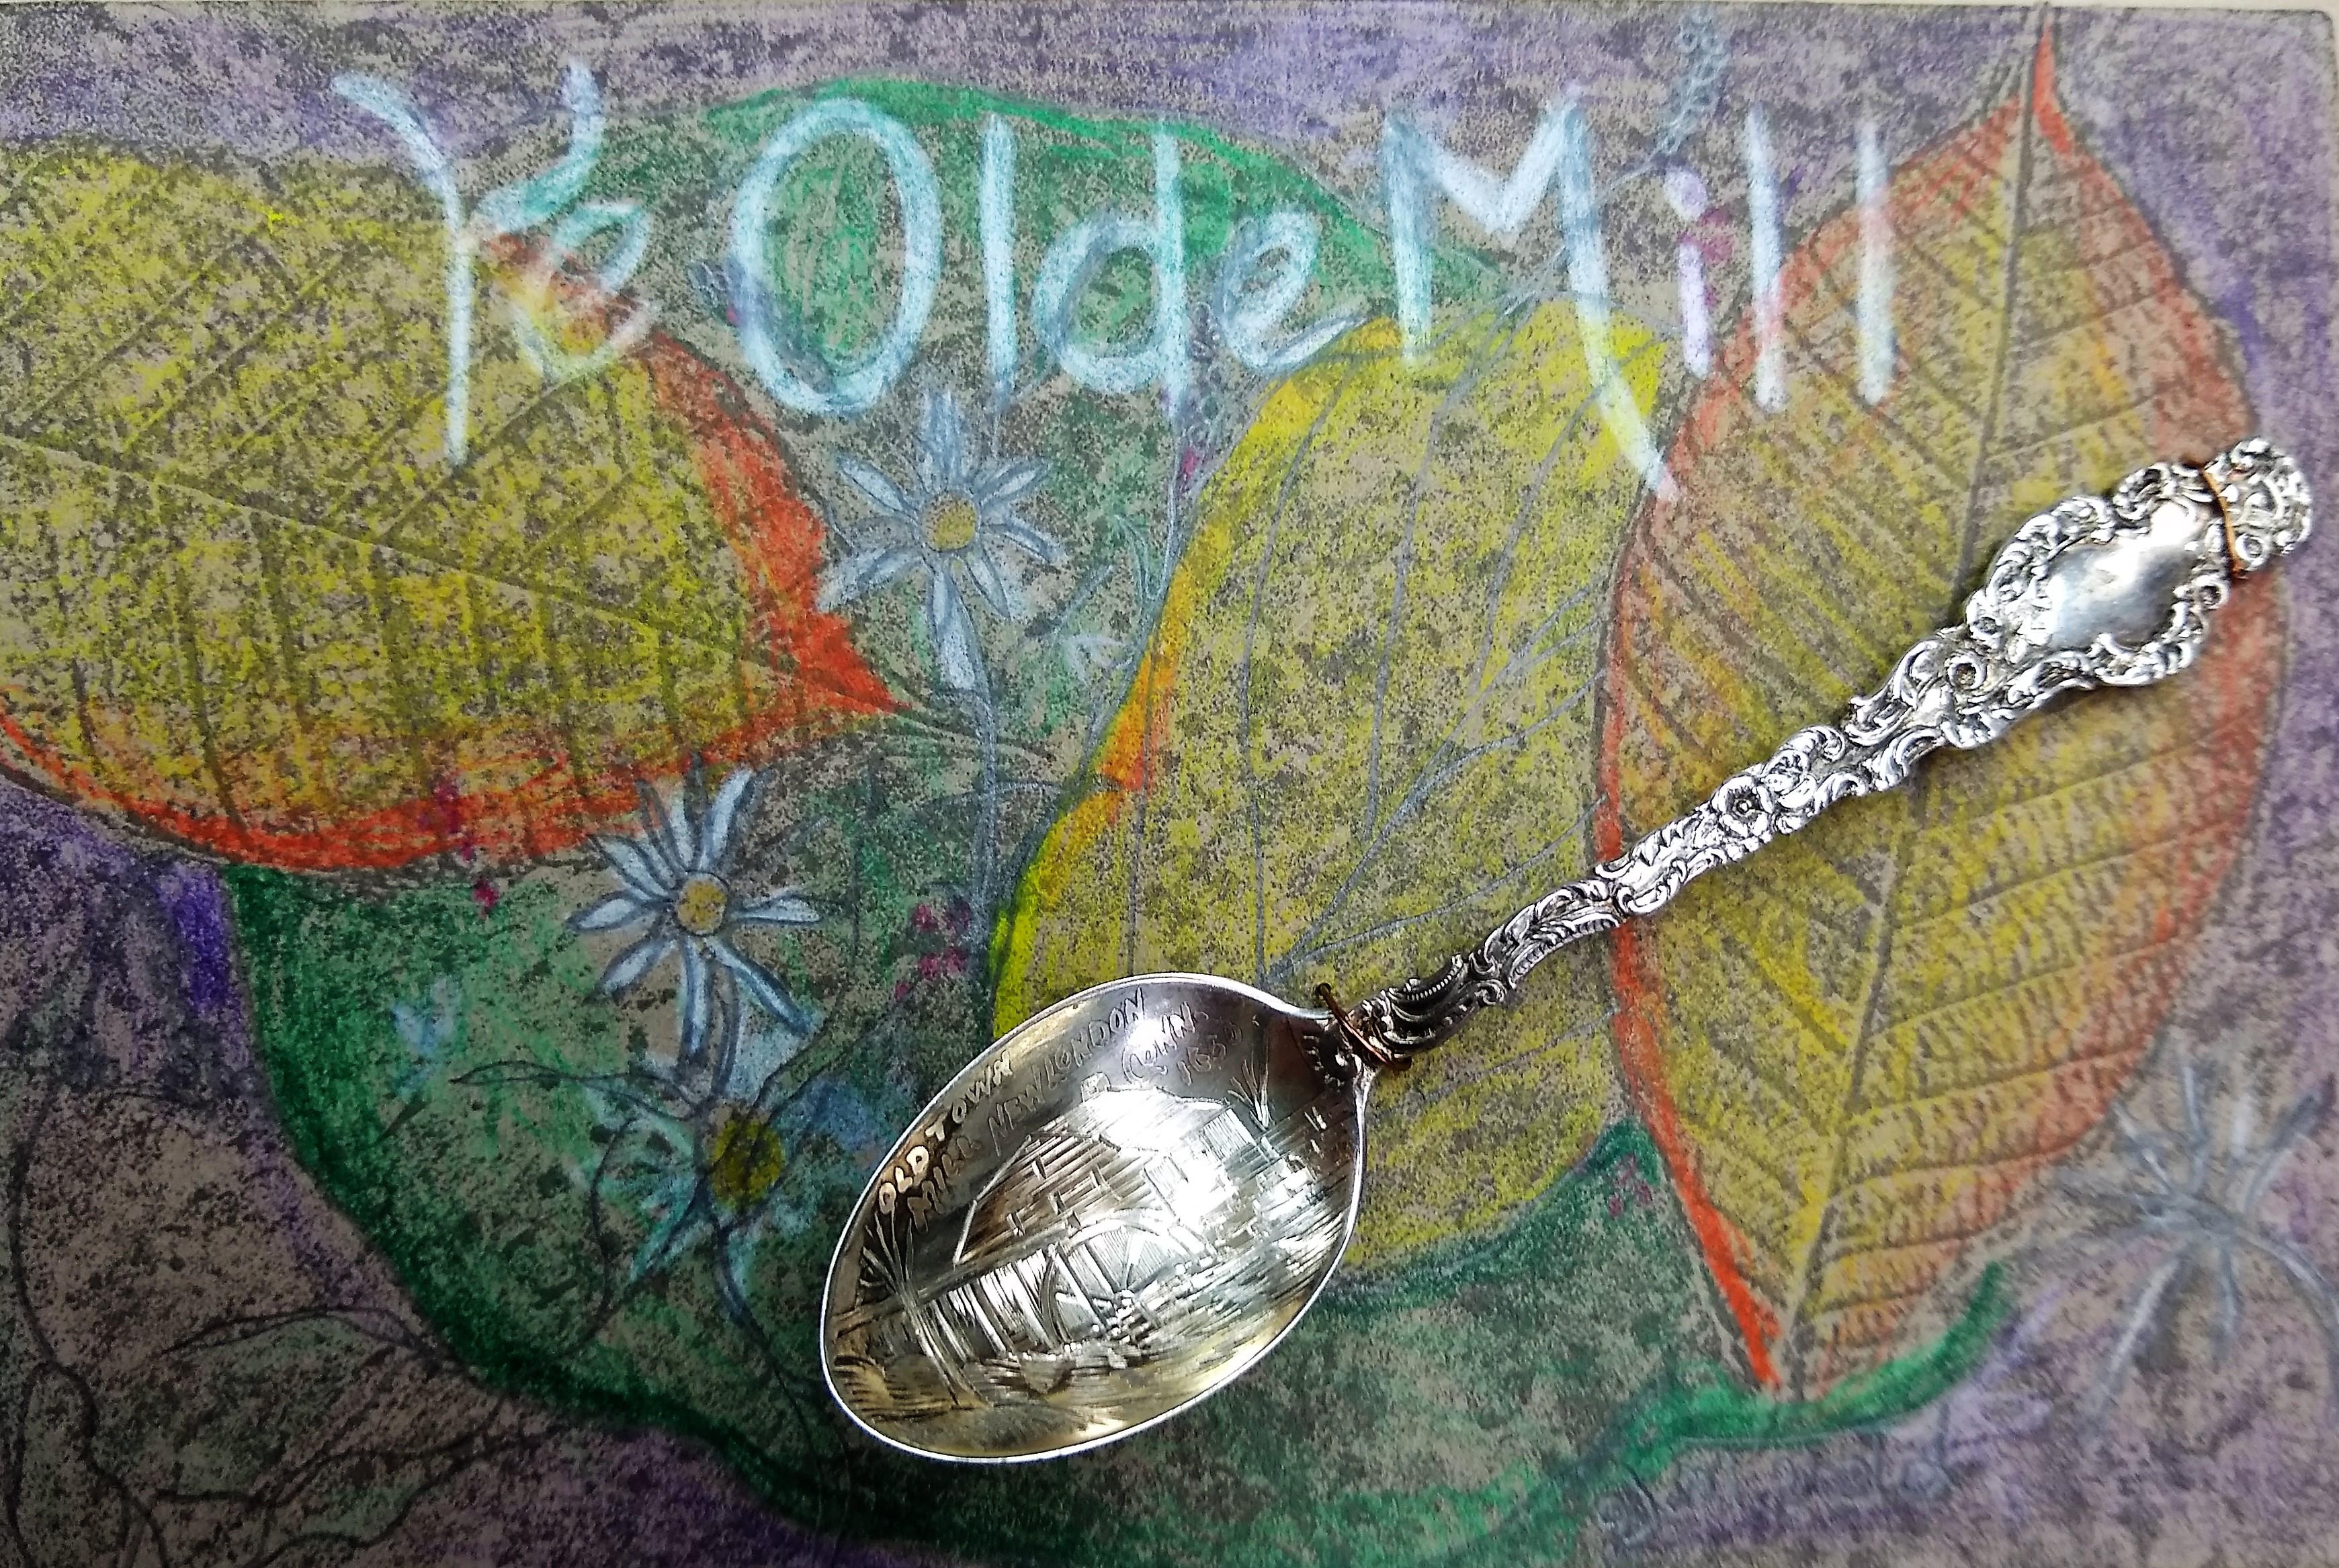 Ye Old Mill, Gretchen van der Lyke, Assemblage On Hand Colored Mat, Postcard #104, $TBD